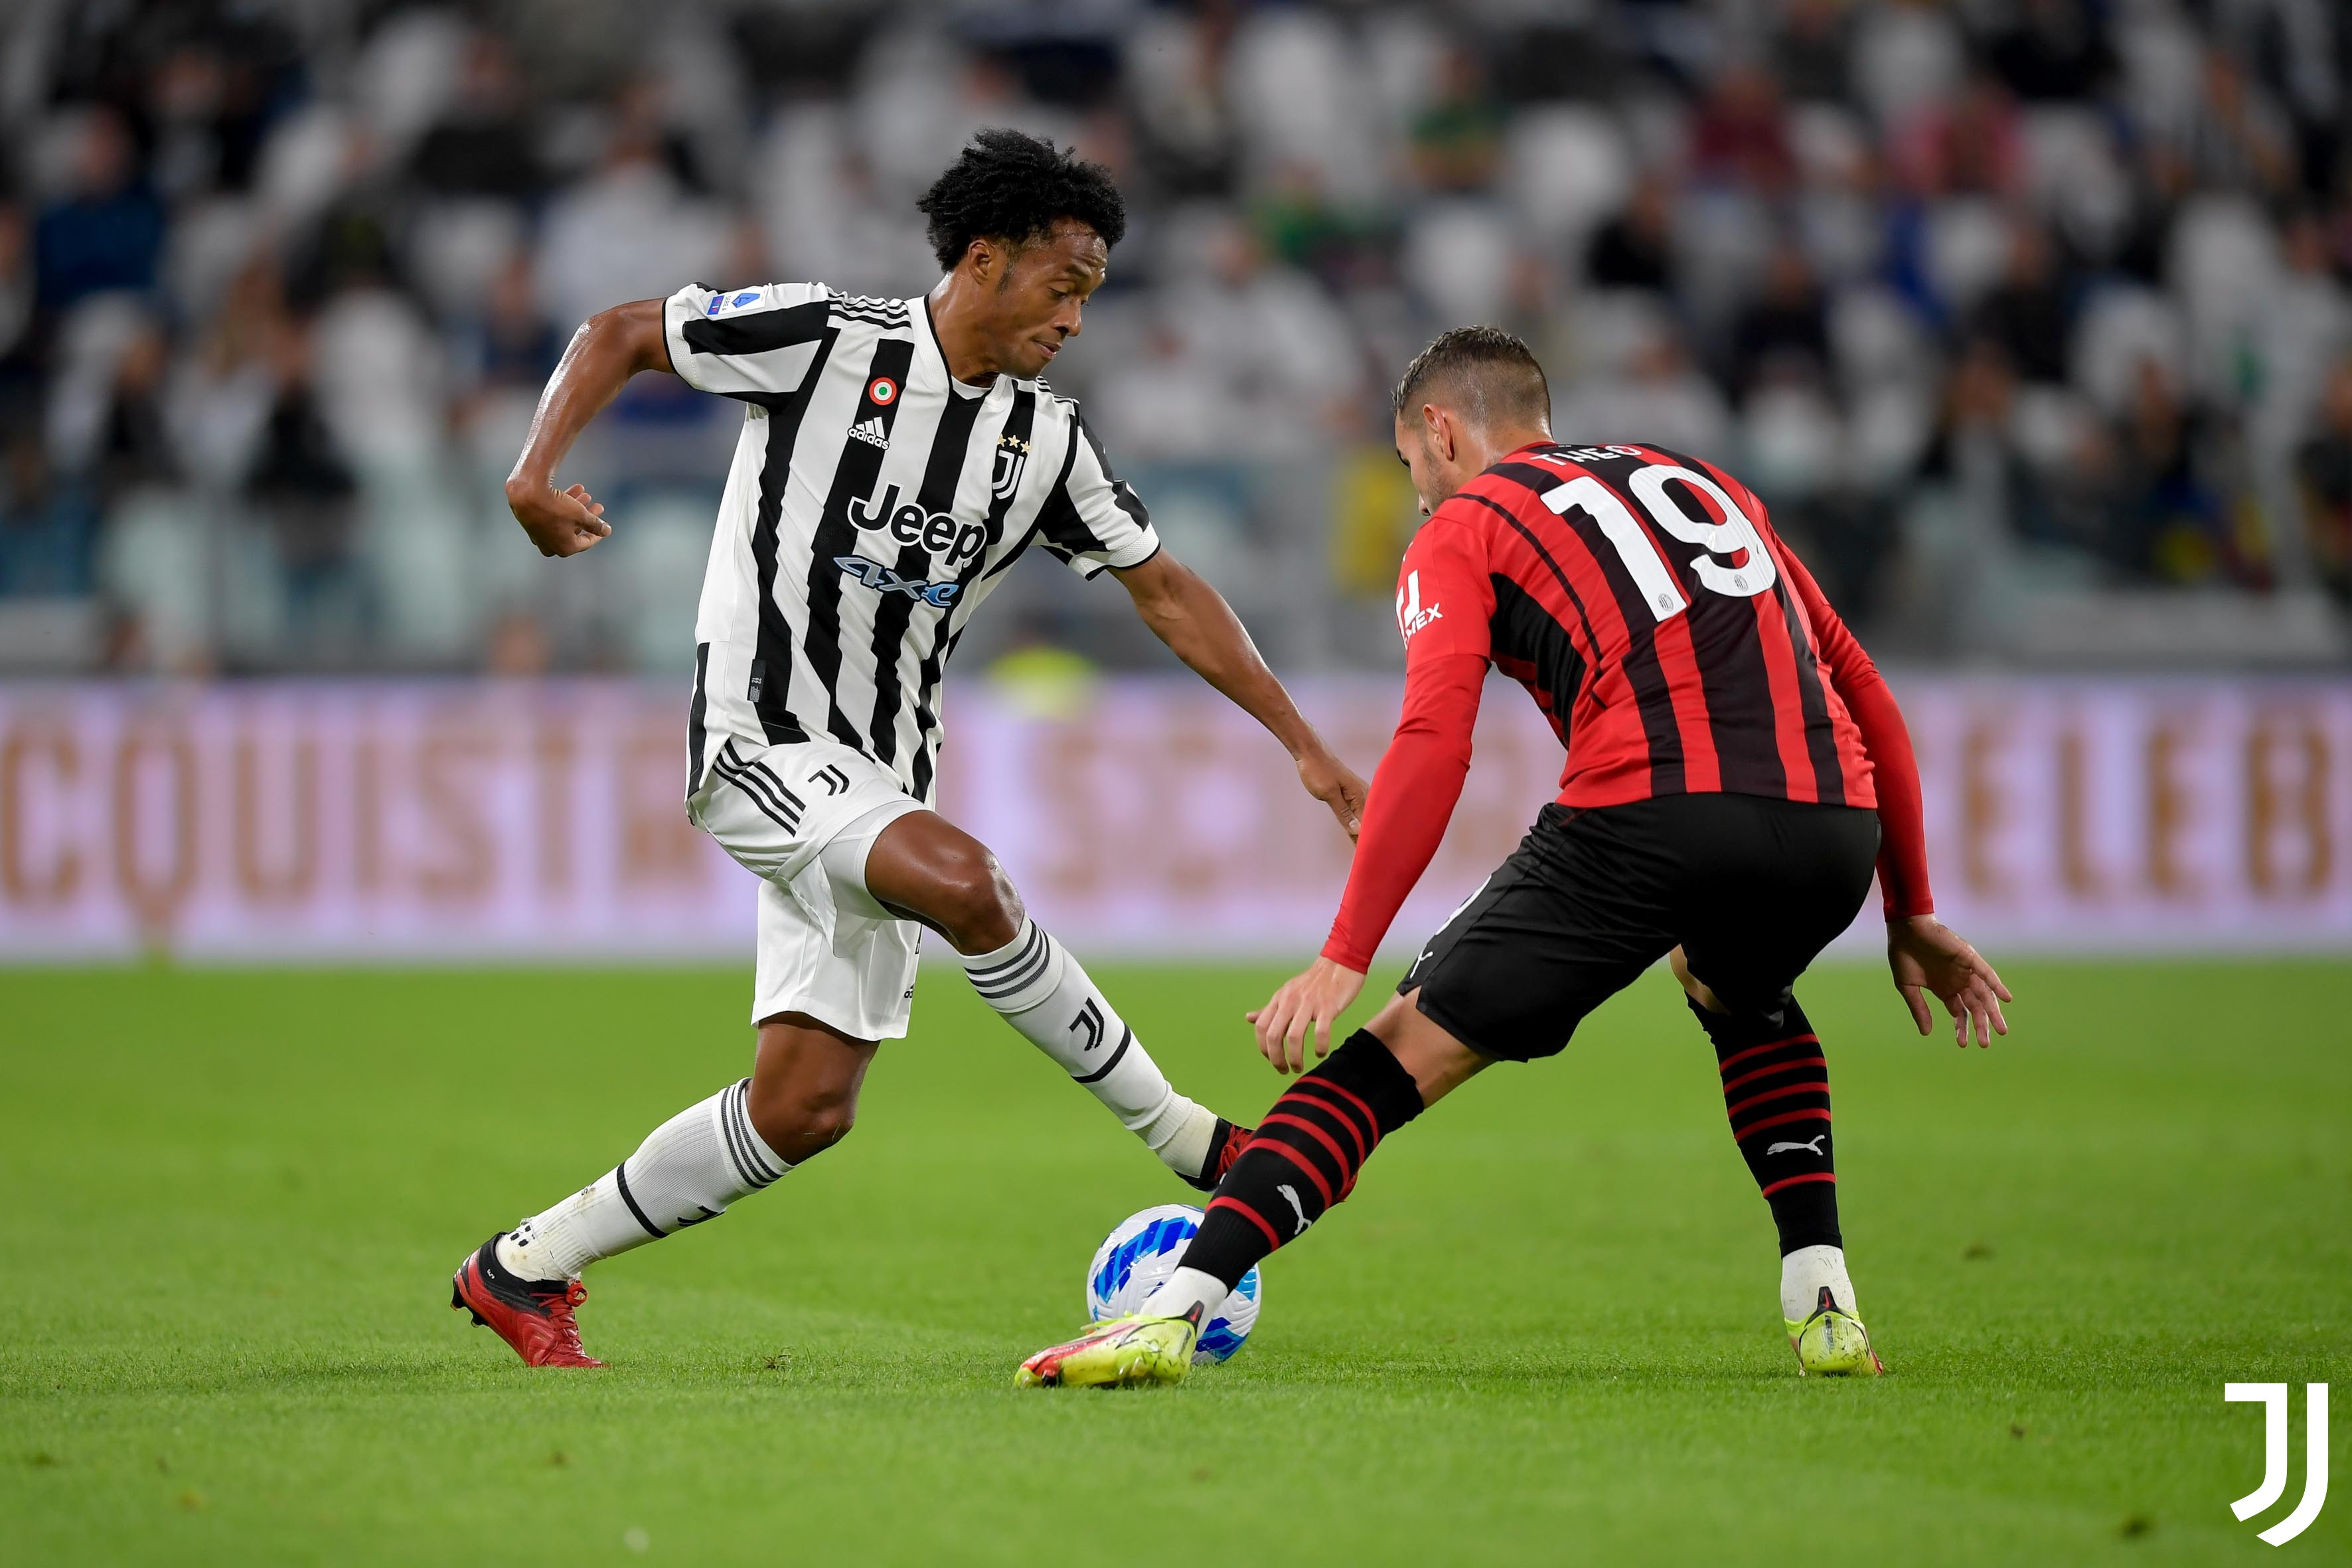 Bermain Imbang Melawan Milan, Juventus Ulang Kenangan Pahit 60 Tahun Lalu - JPNN.com